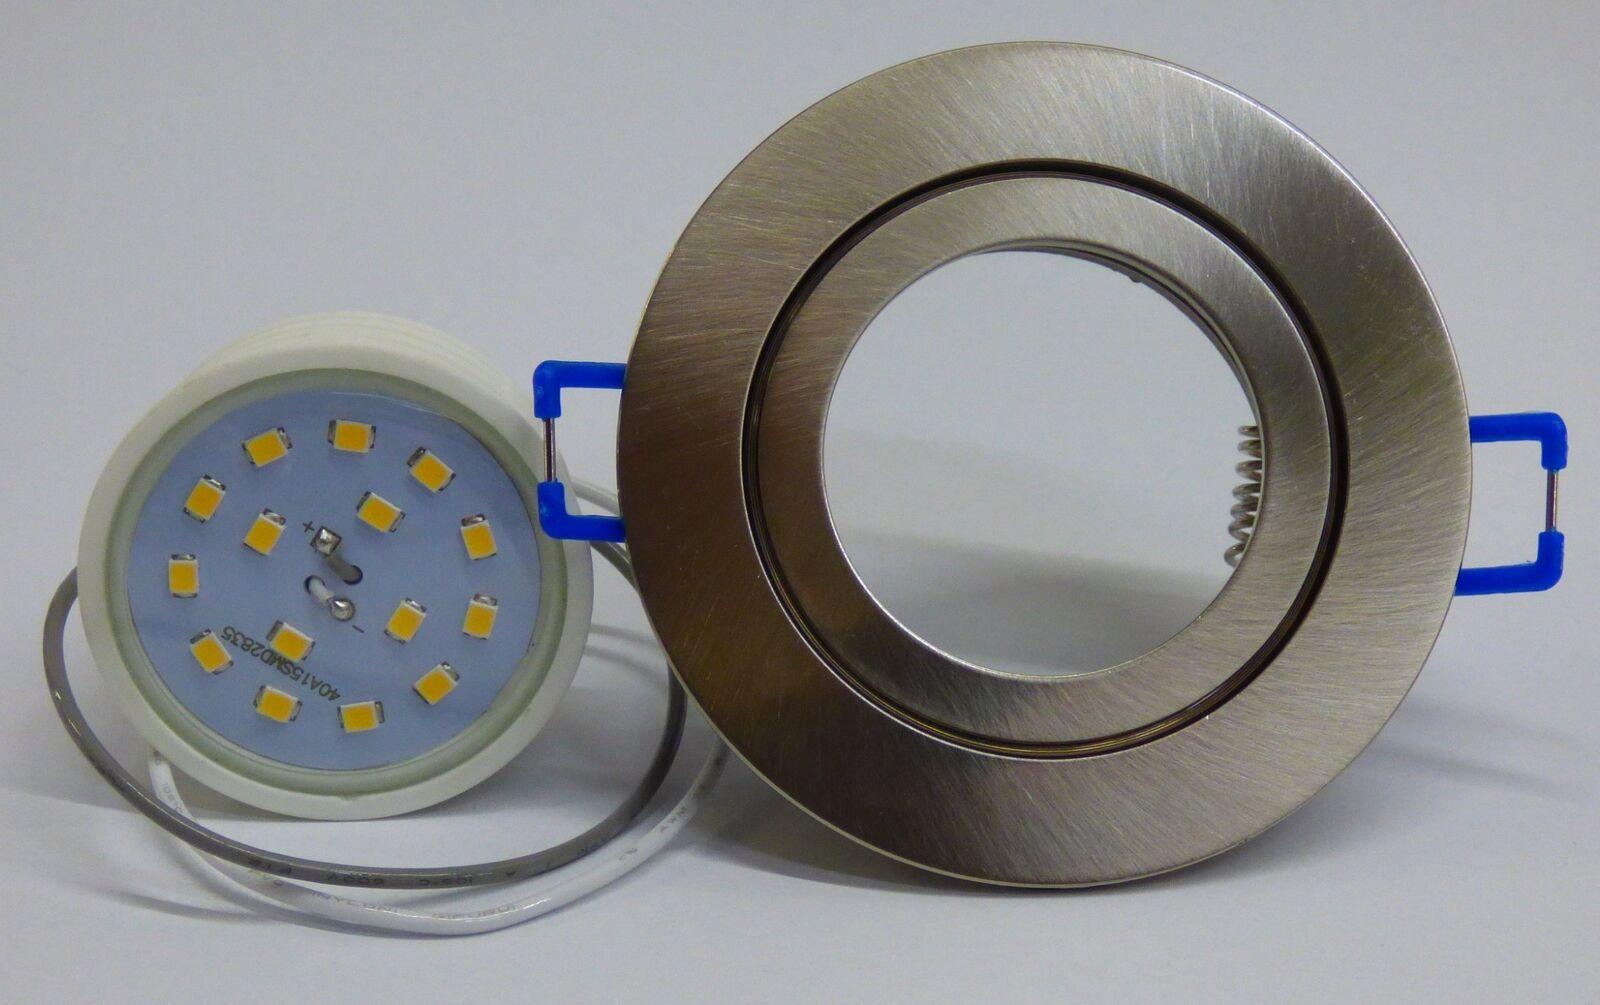 10xFlacher Led Feuchtraum Einbaustrahler NM+Flat Led ww 120° Einbautiefe 30mm